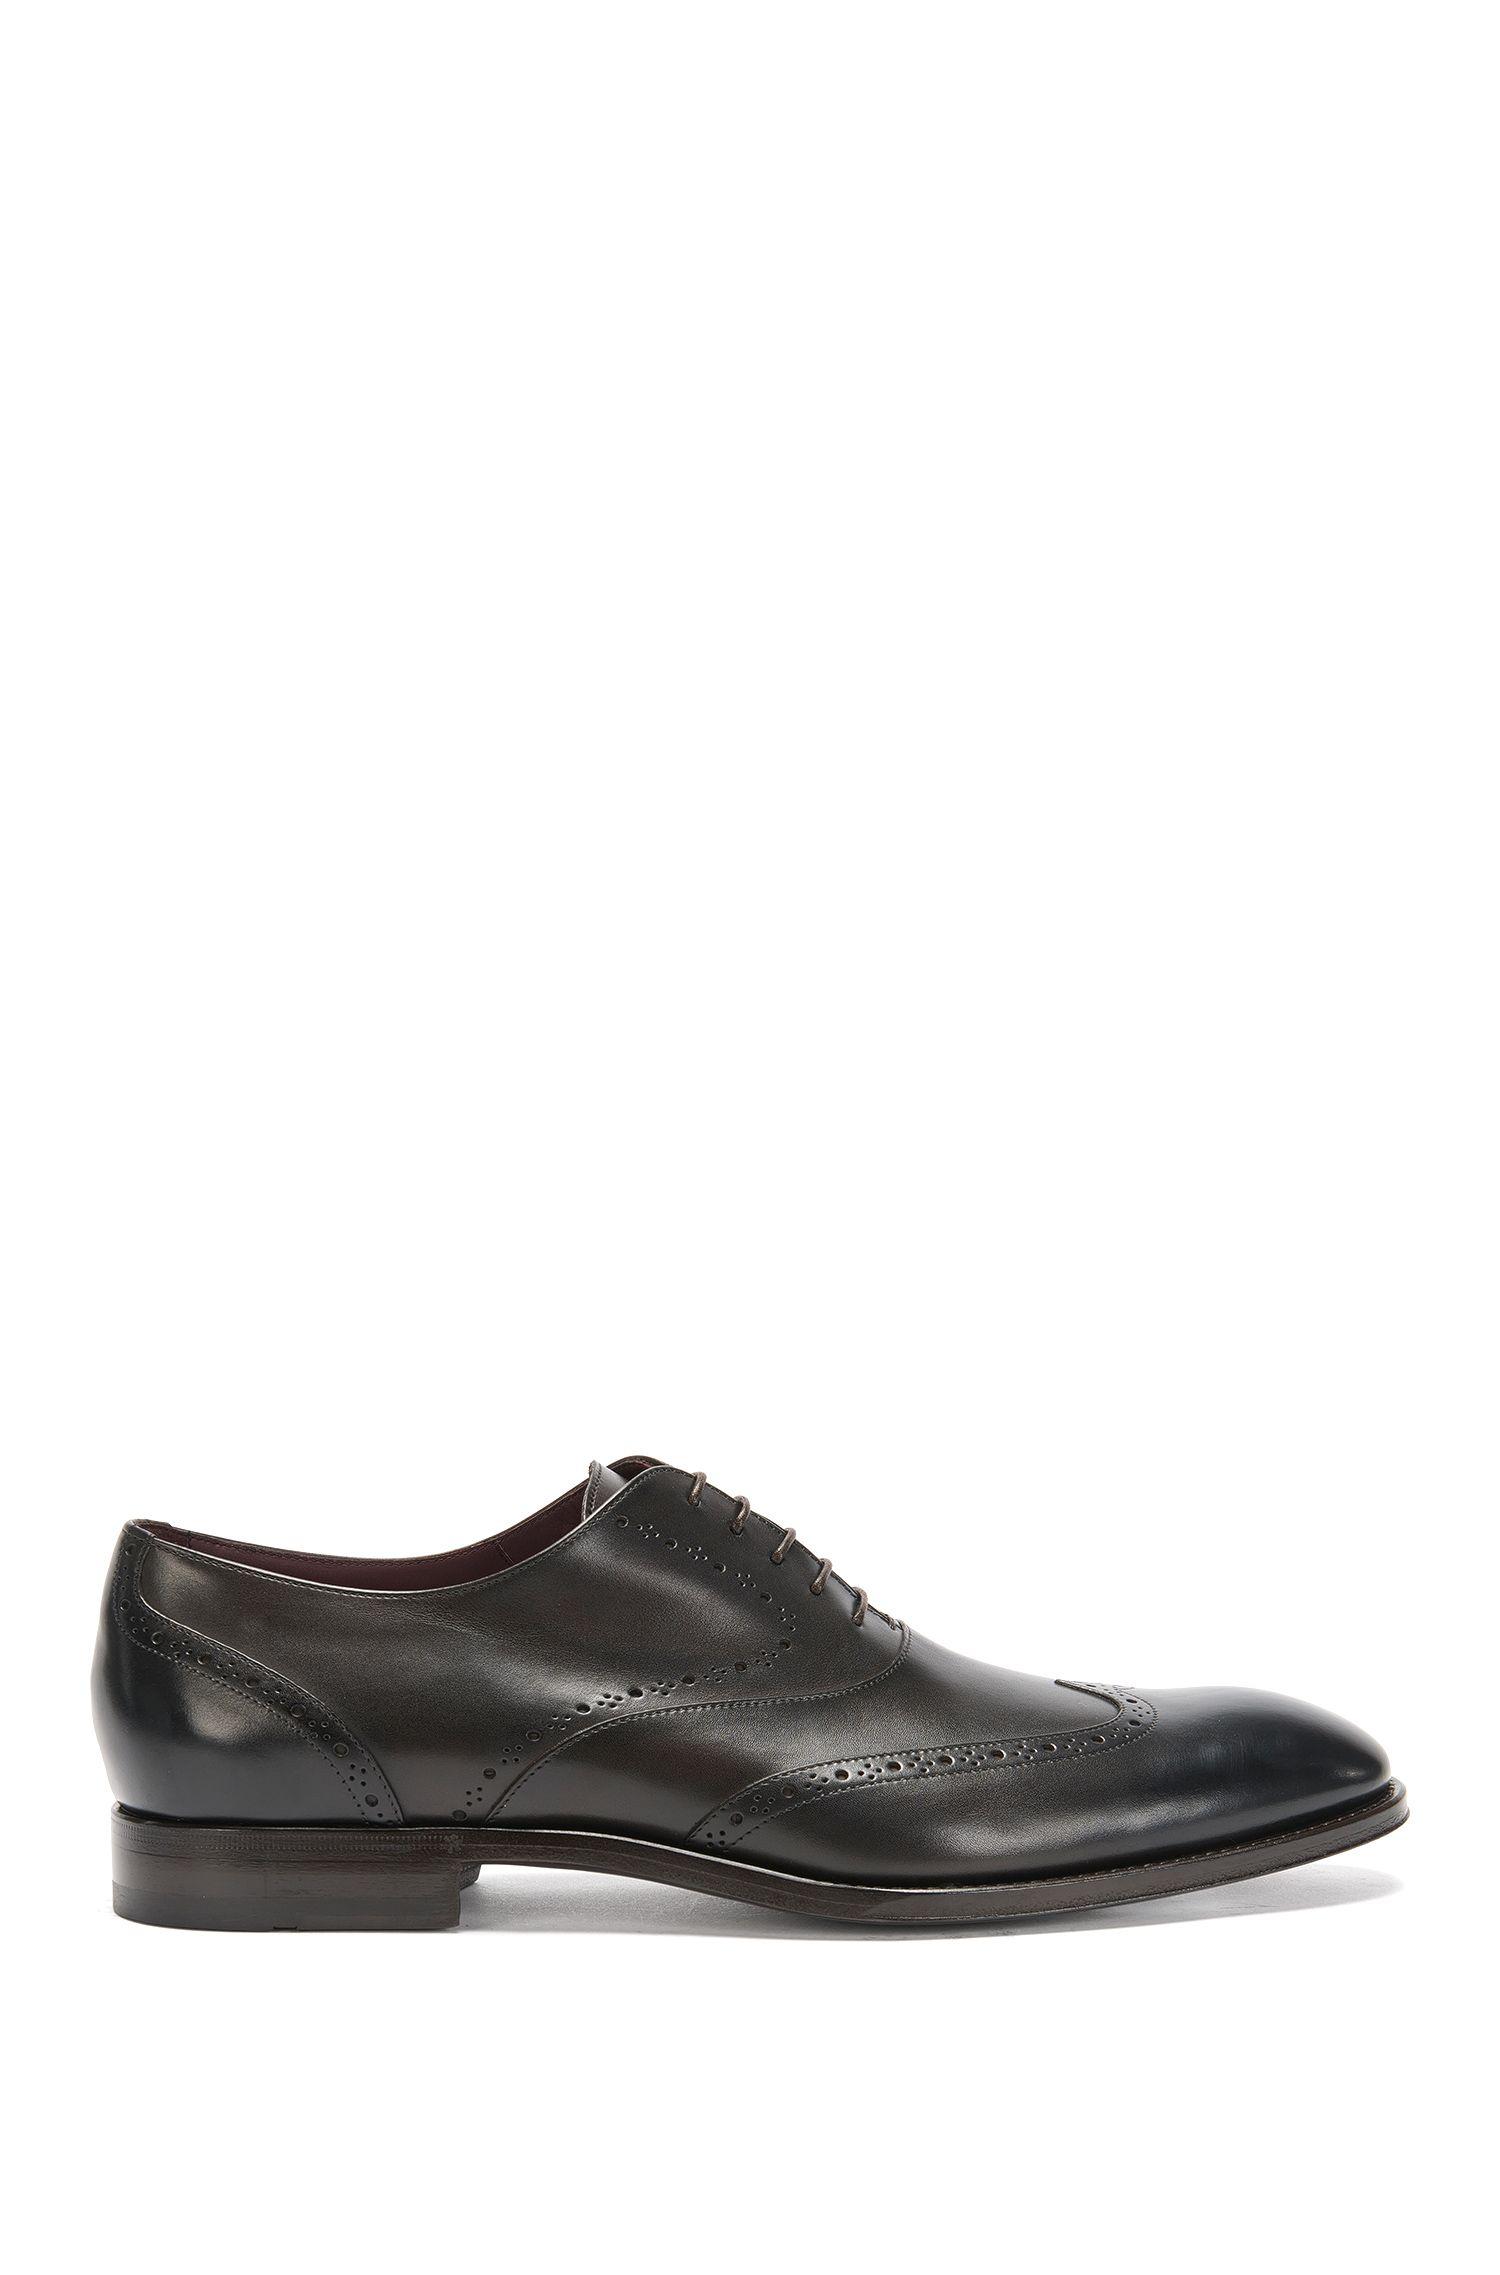 Italian Calfskin Oxford Wingtip Dress Shoe | T-Legend Oxfr Wt